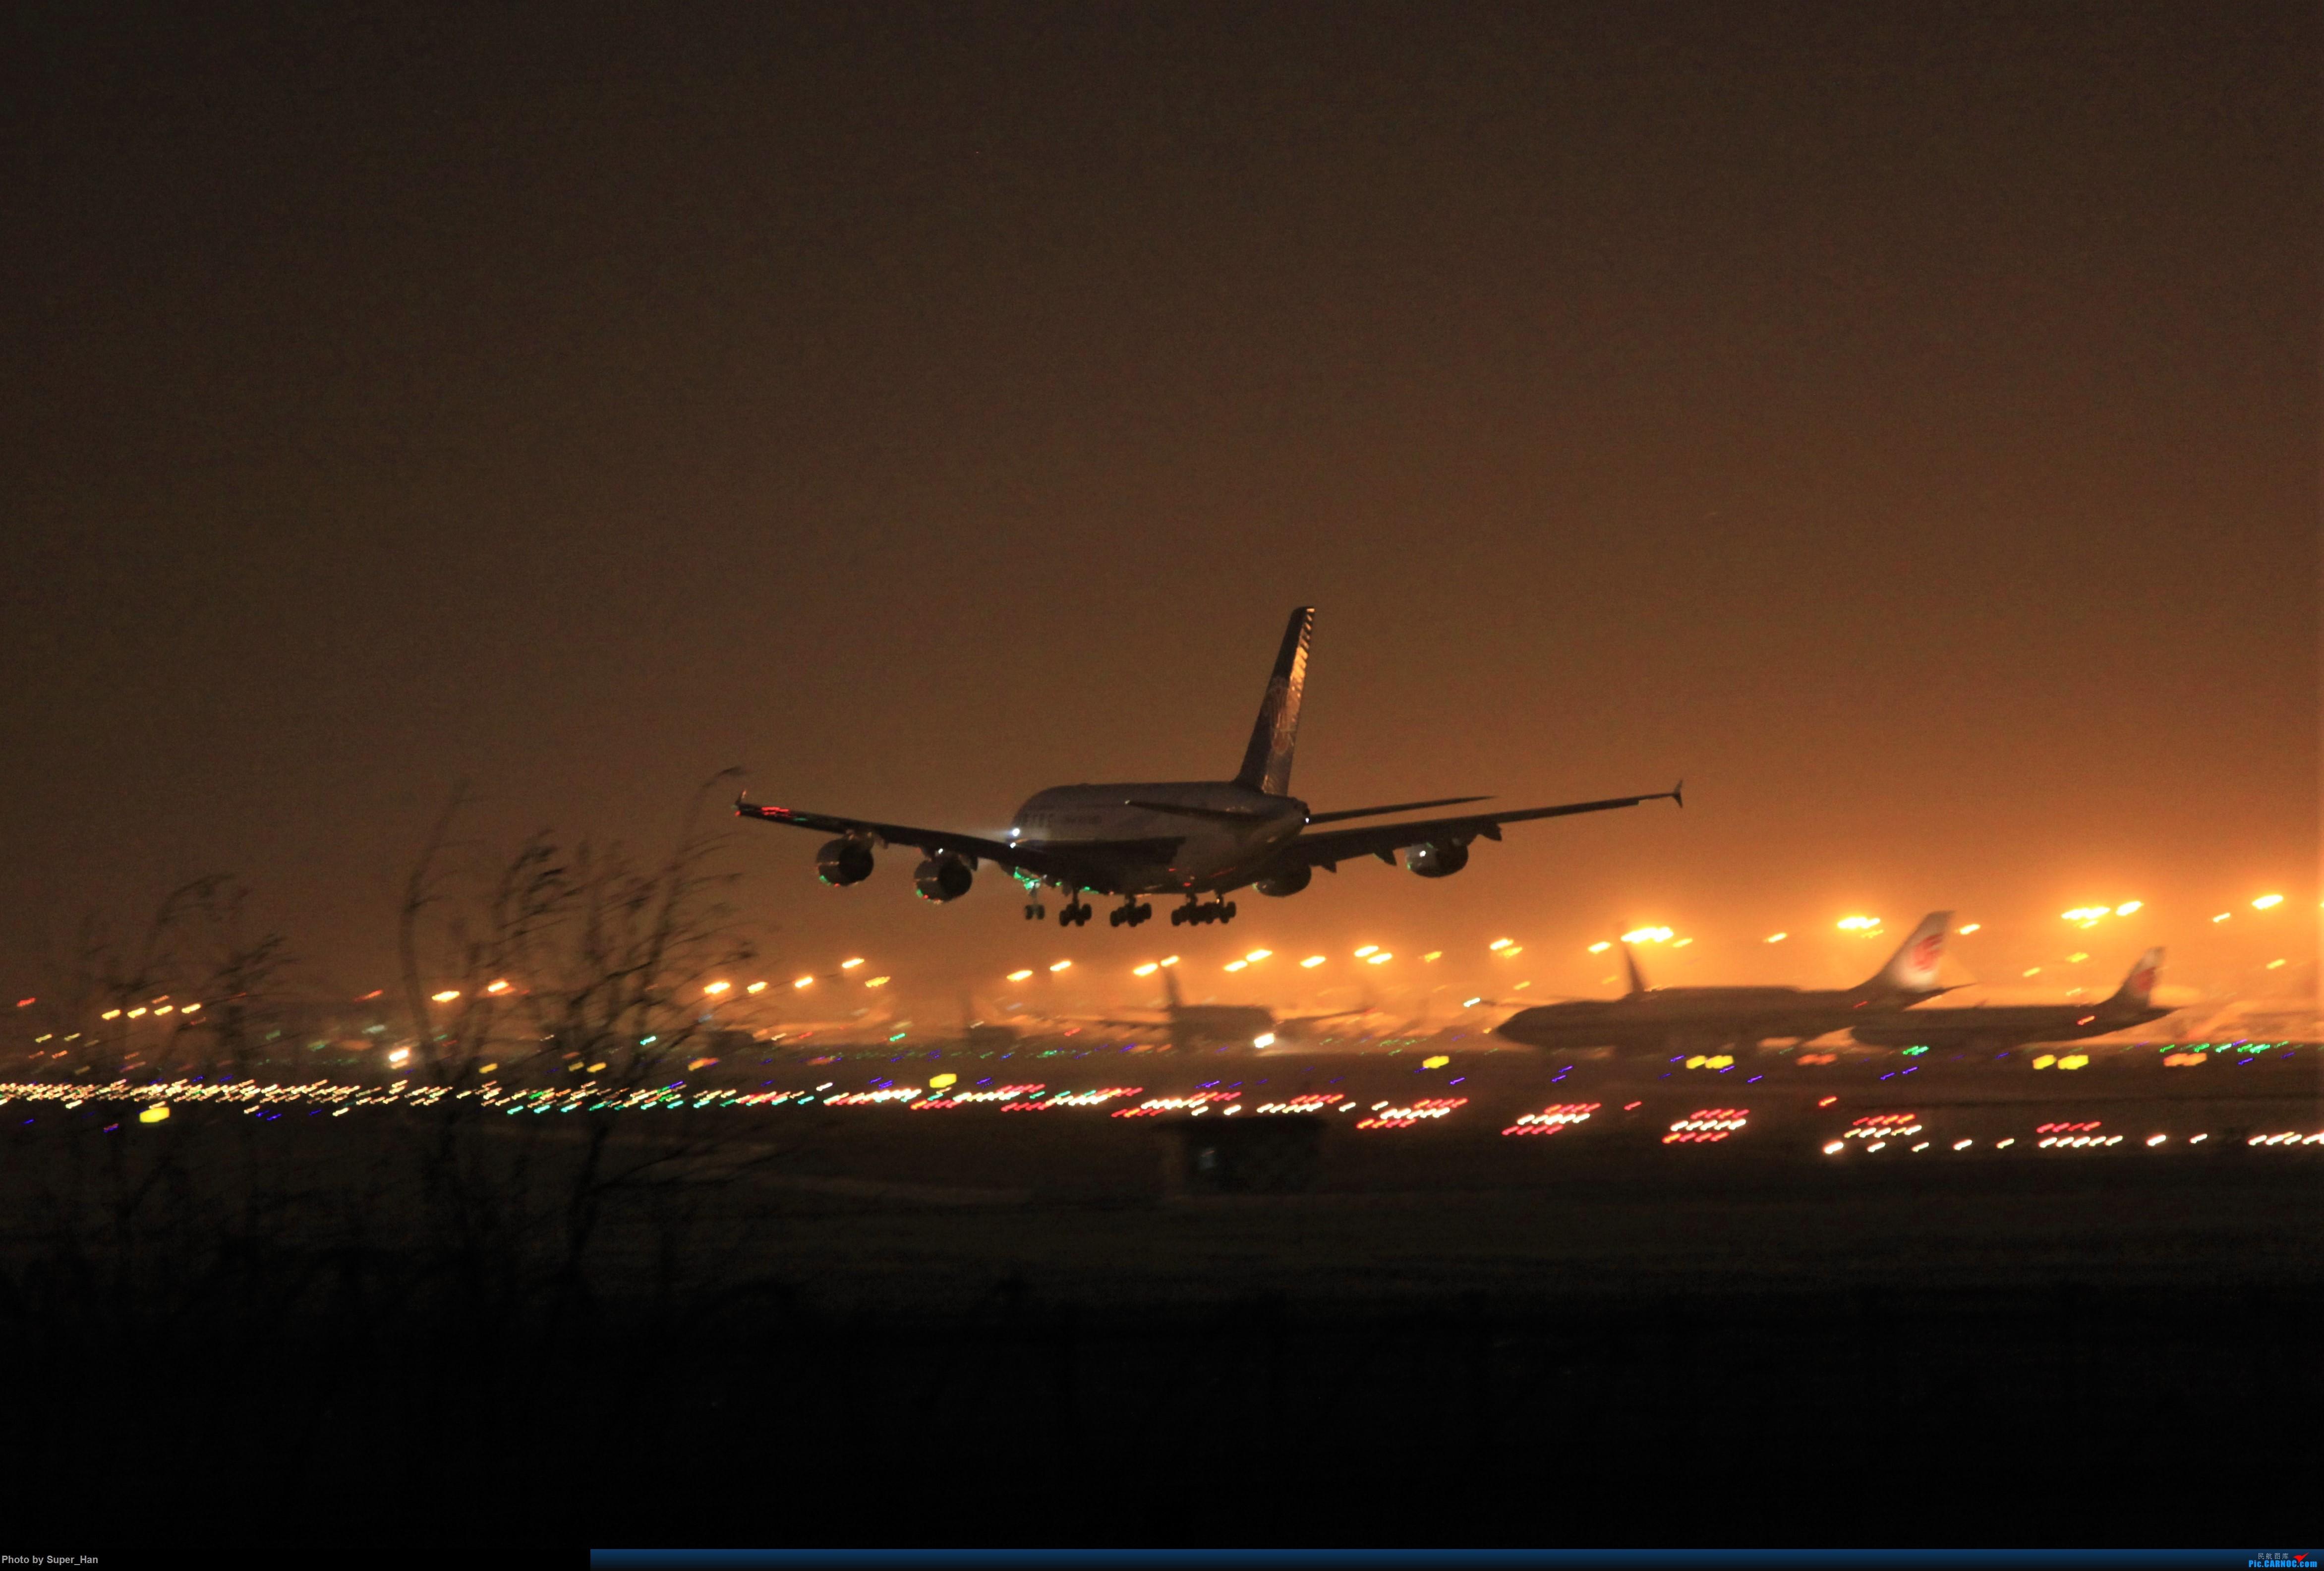 Re:[原创]2019虹桥出发飞北京第一拍 AIRBUS A380 B-6138 中国北京首都国际机场